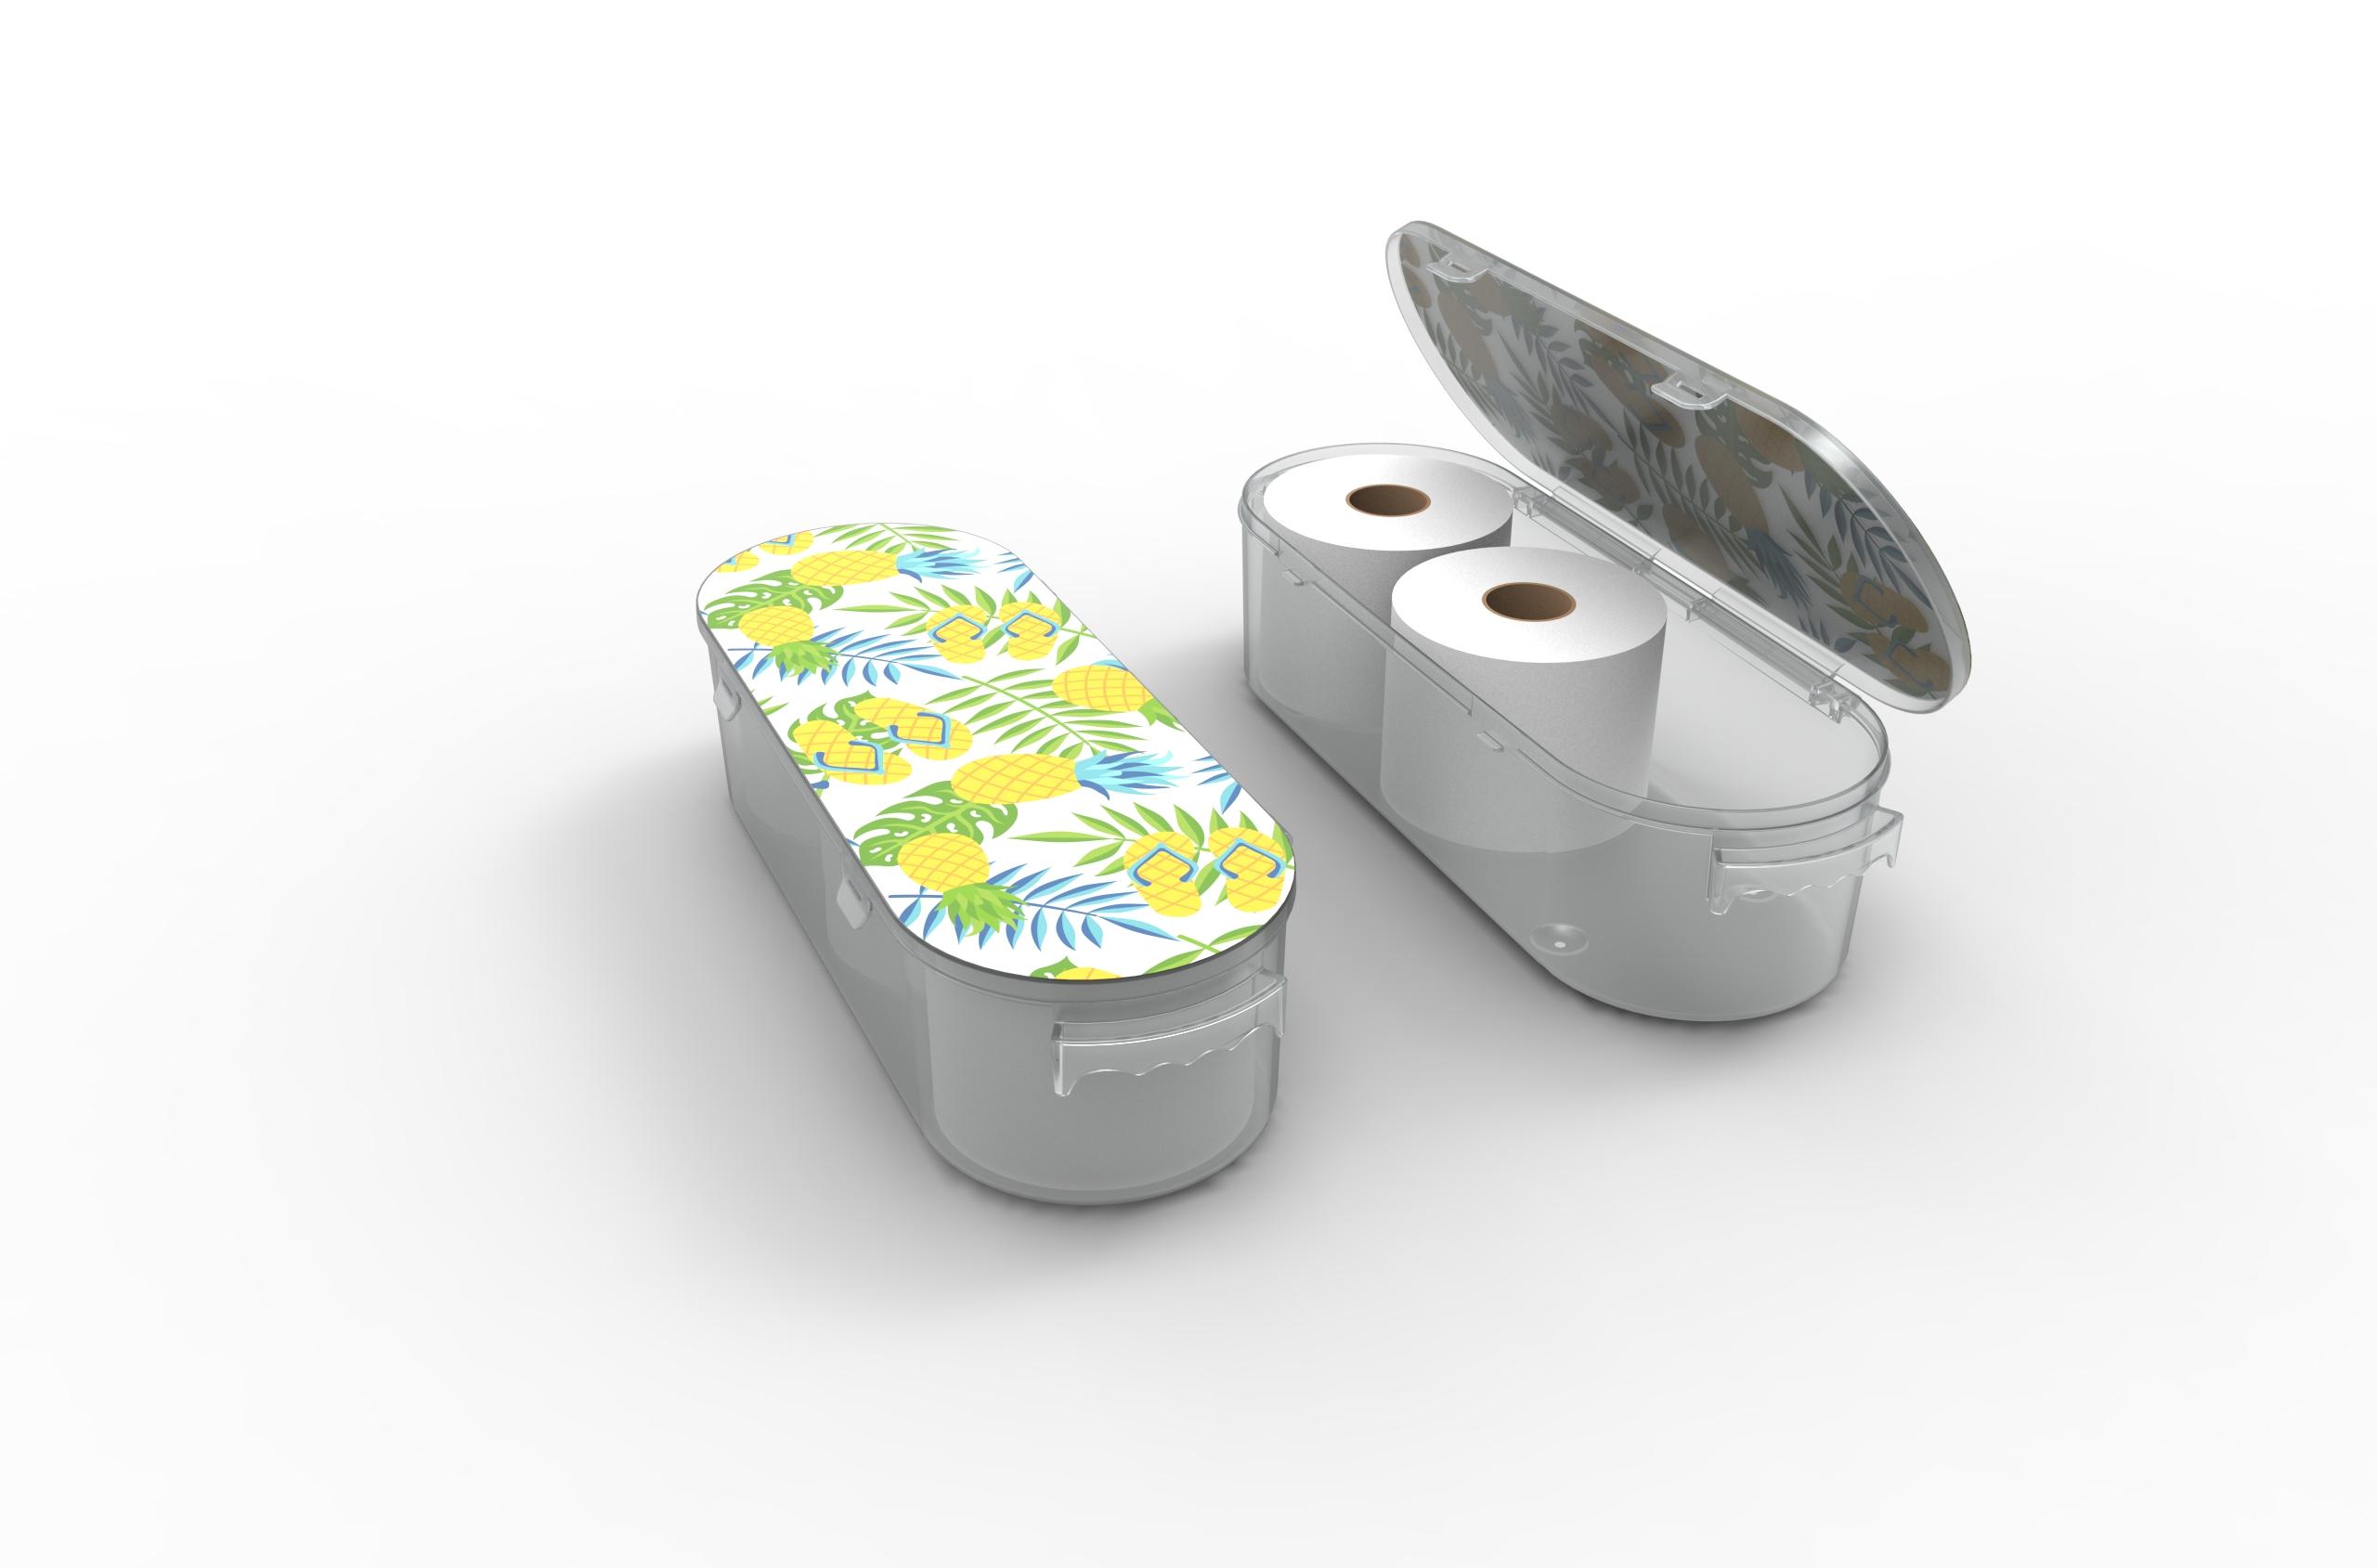 Nykia Designs Bathroom Toilet Paper Storage Solution - Pineapples